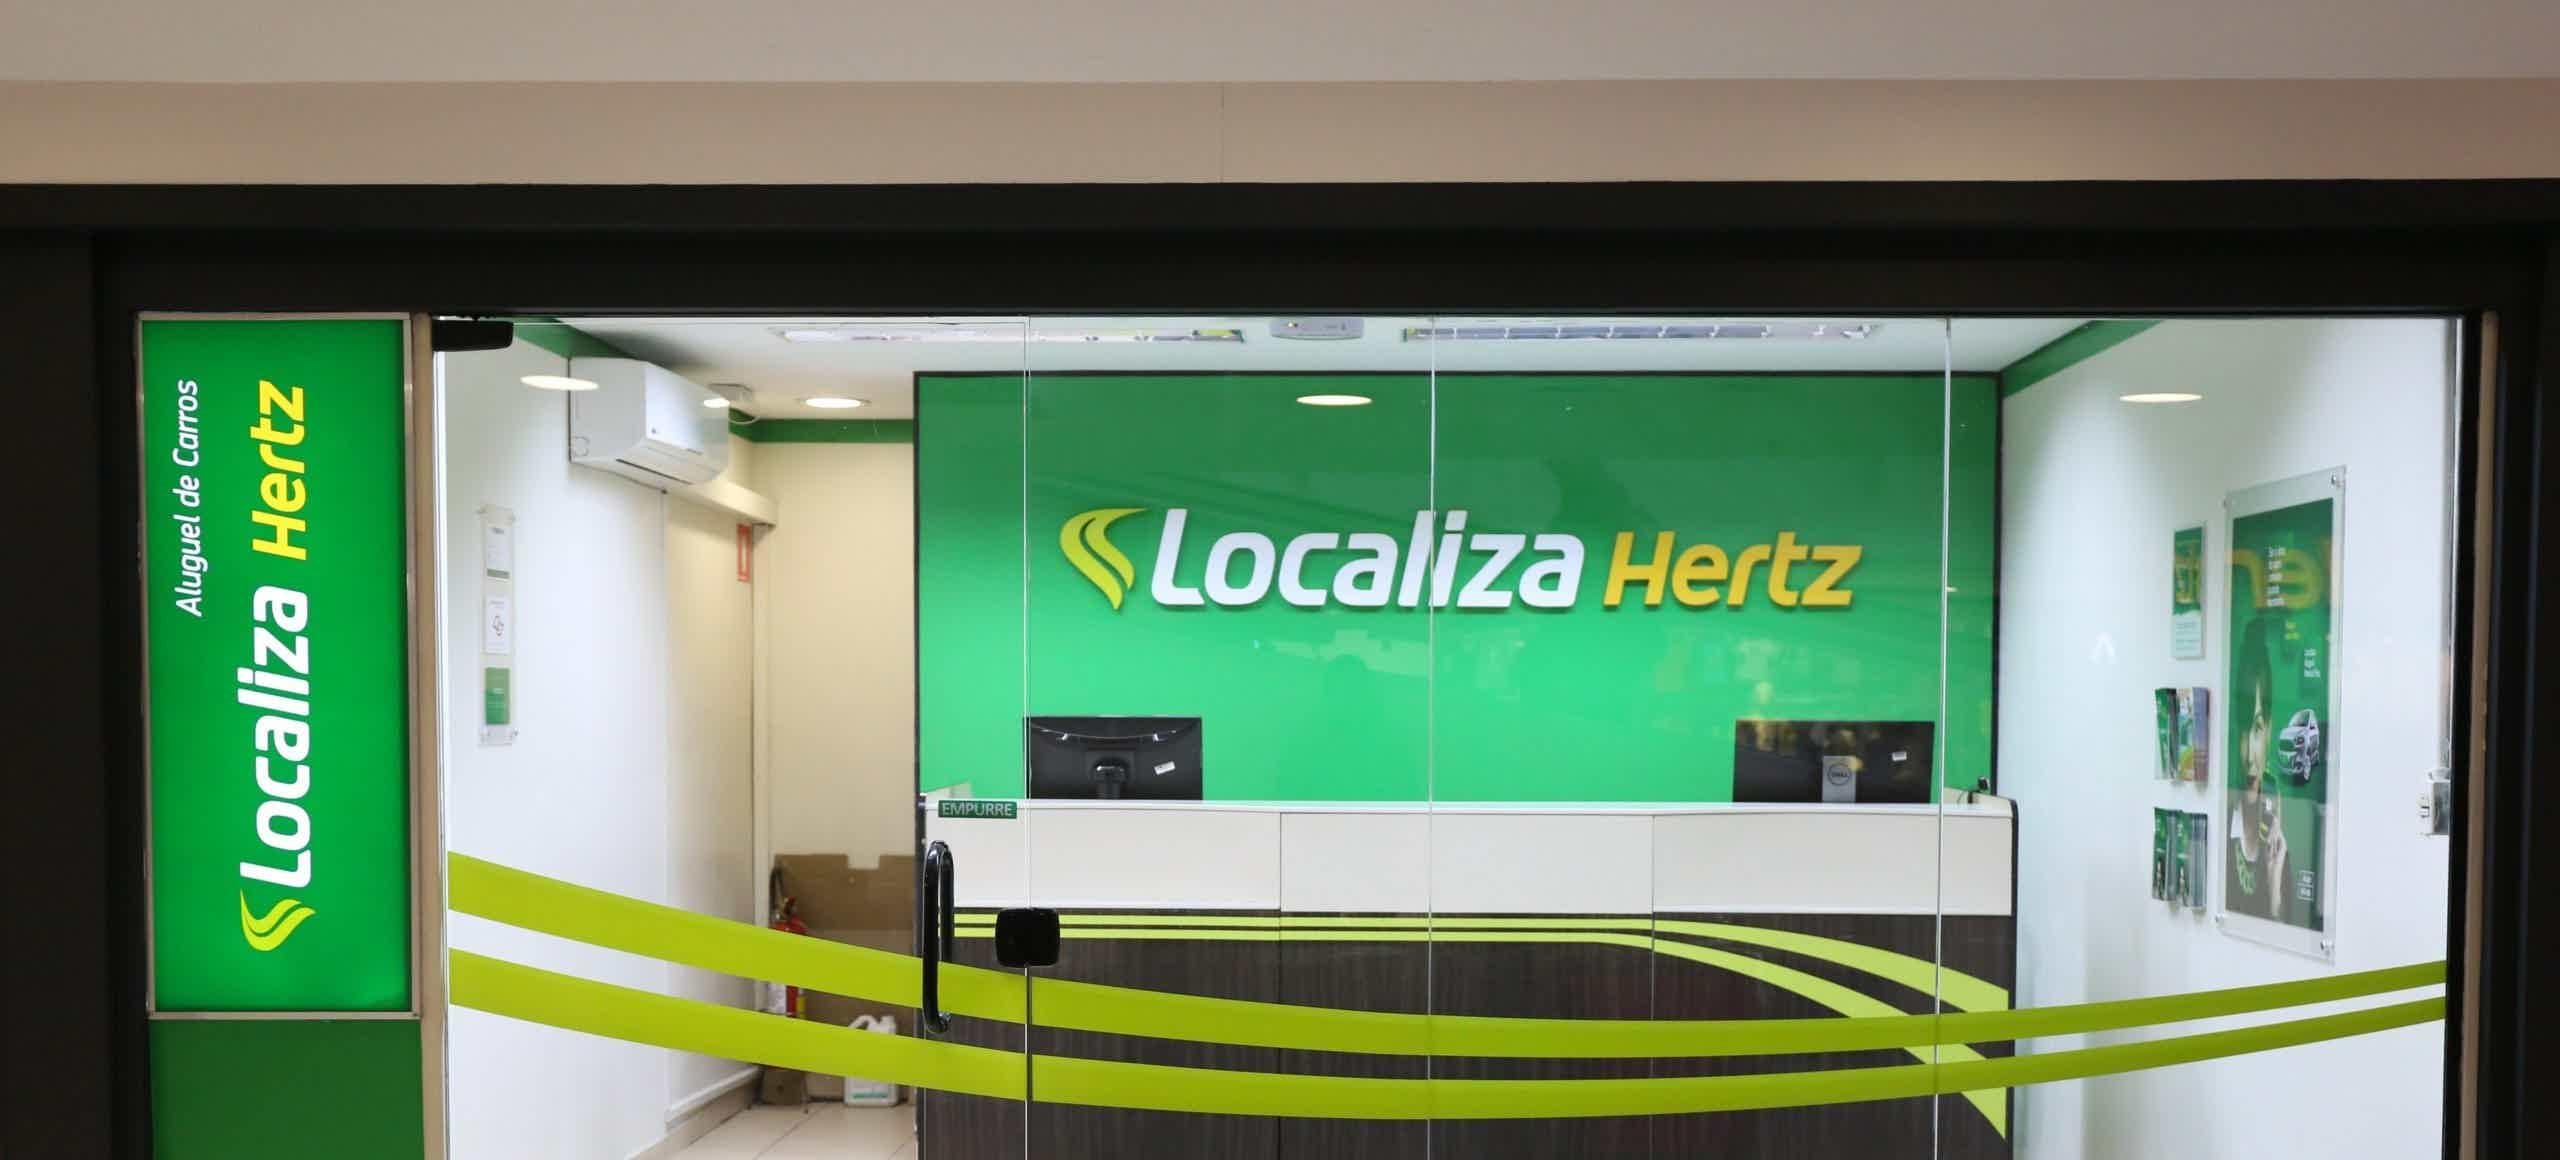 Alugar carro na localiza Hertz